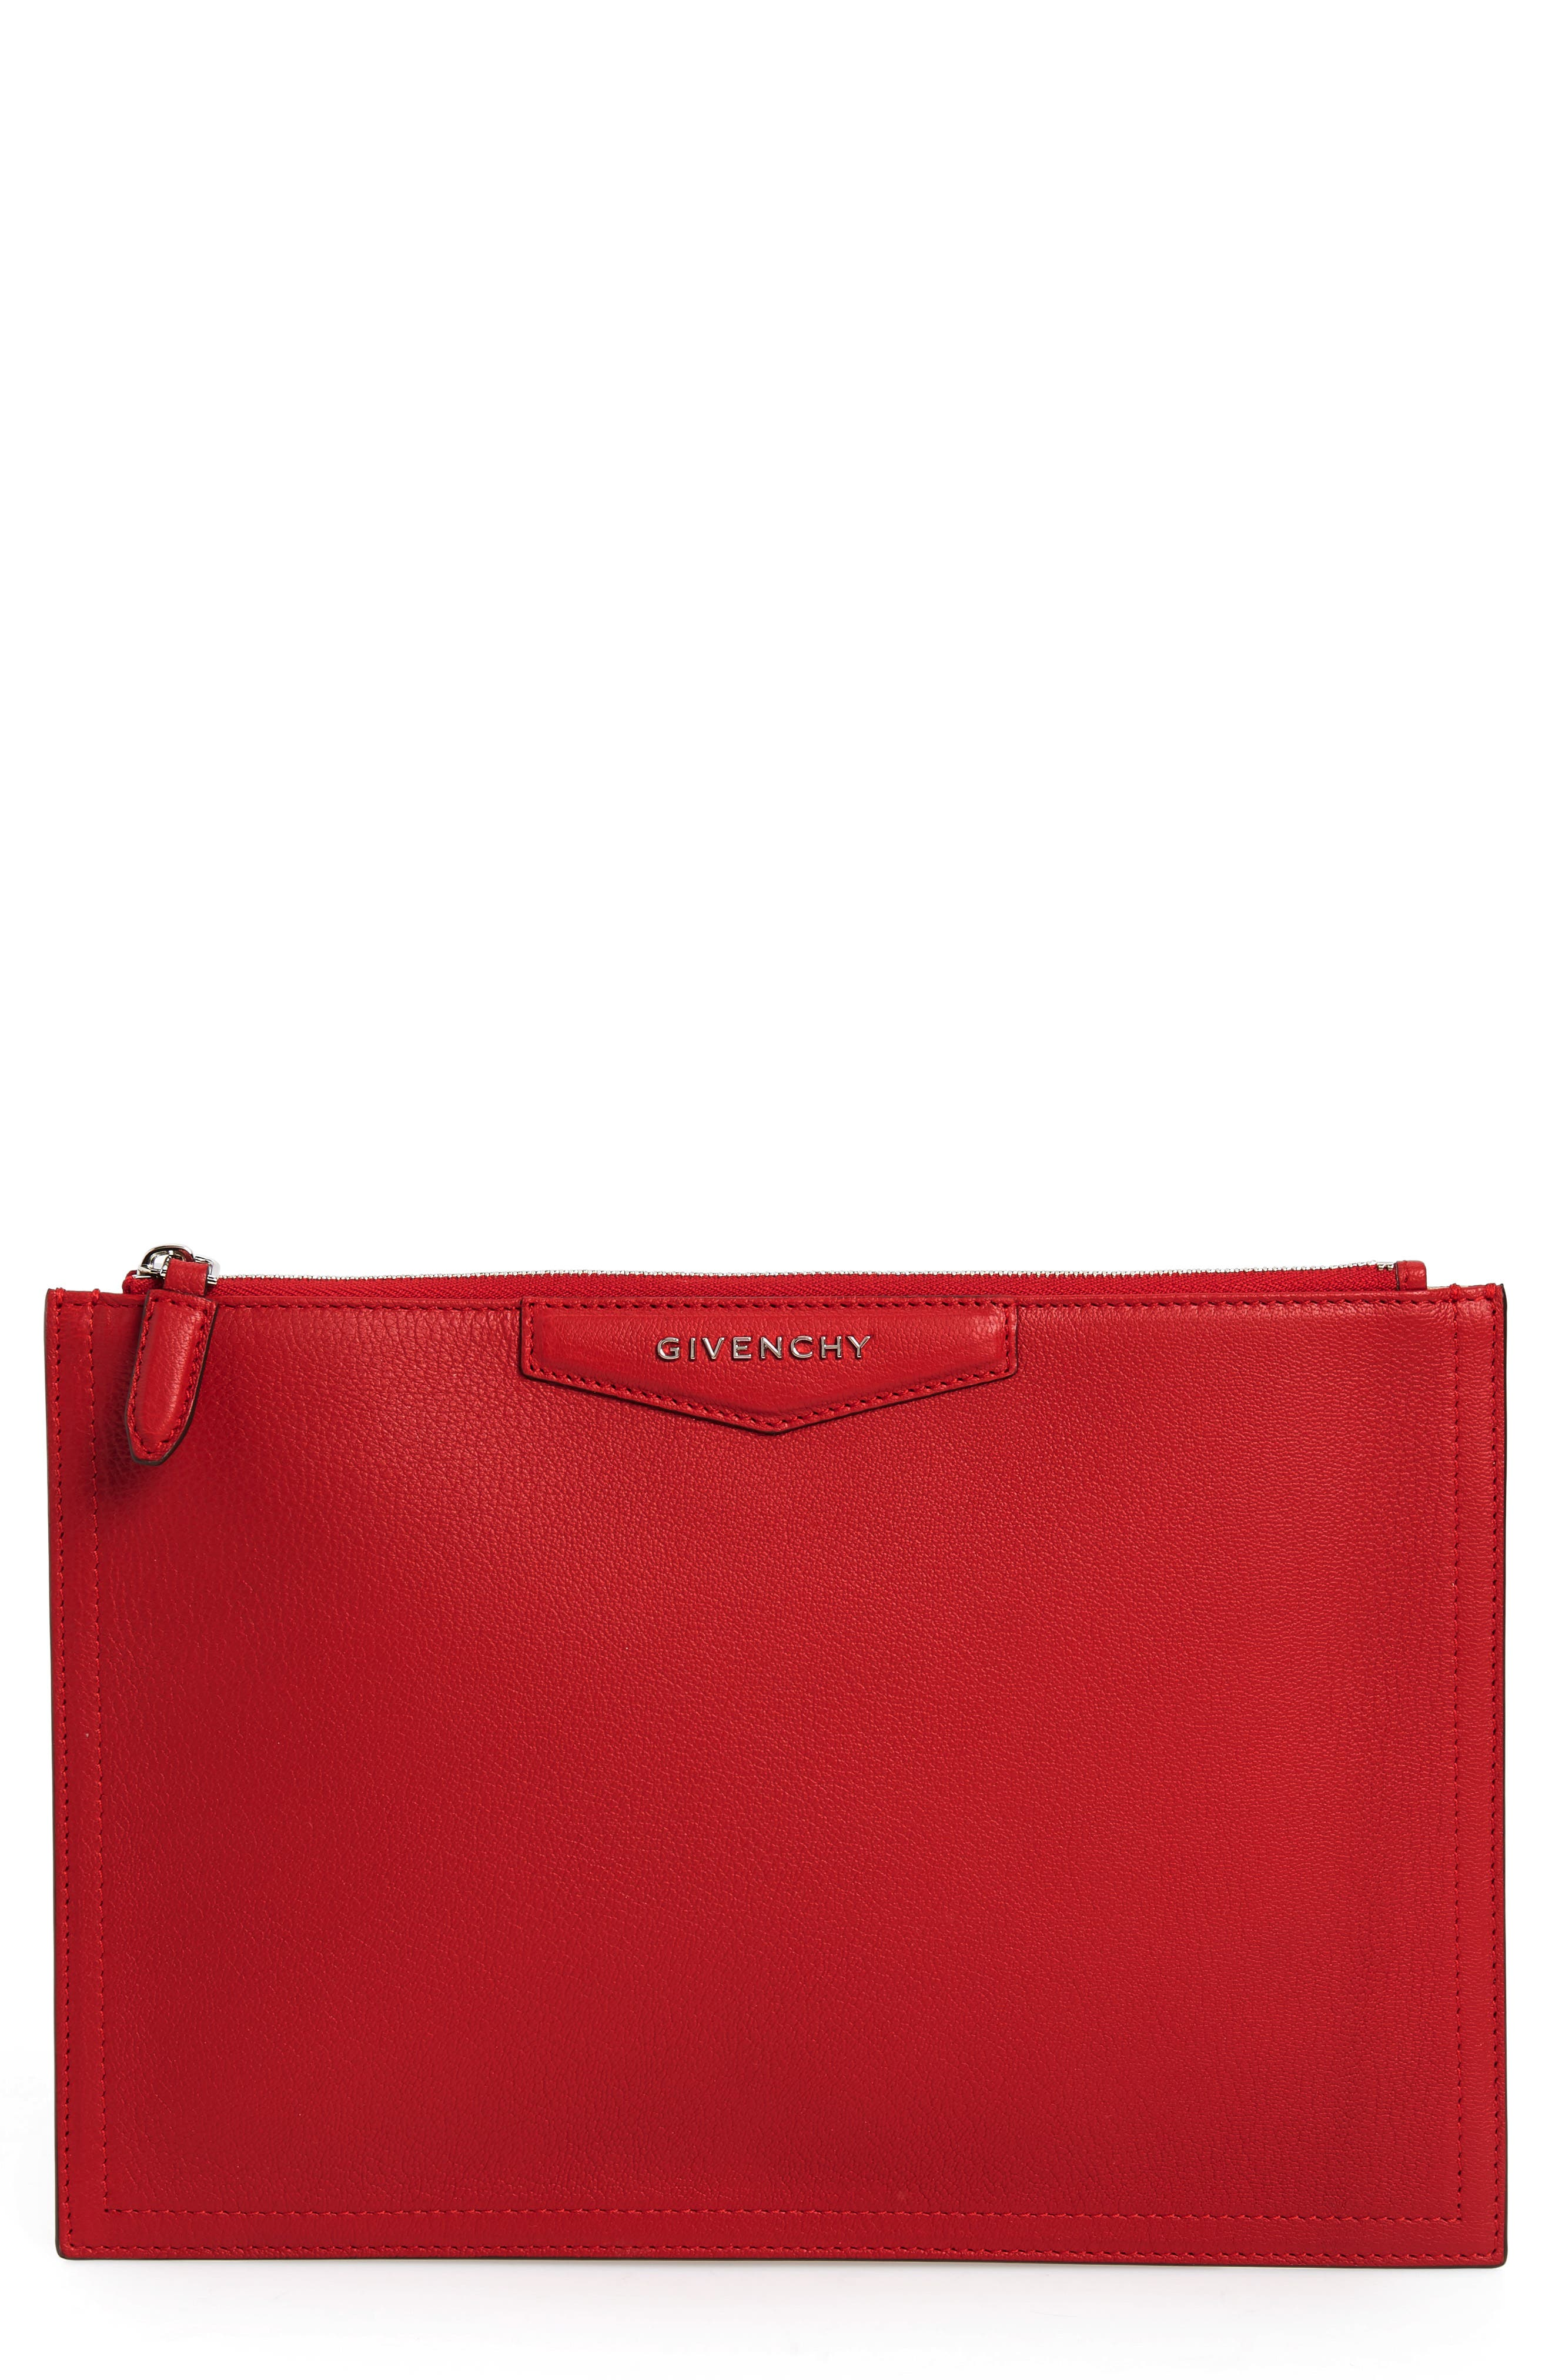 Medium Antigona Leather Pouch,                             Main thumbnail 1, color,                             Bright Red